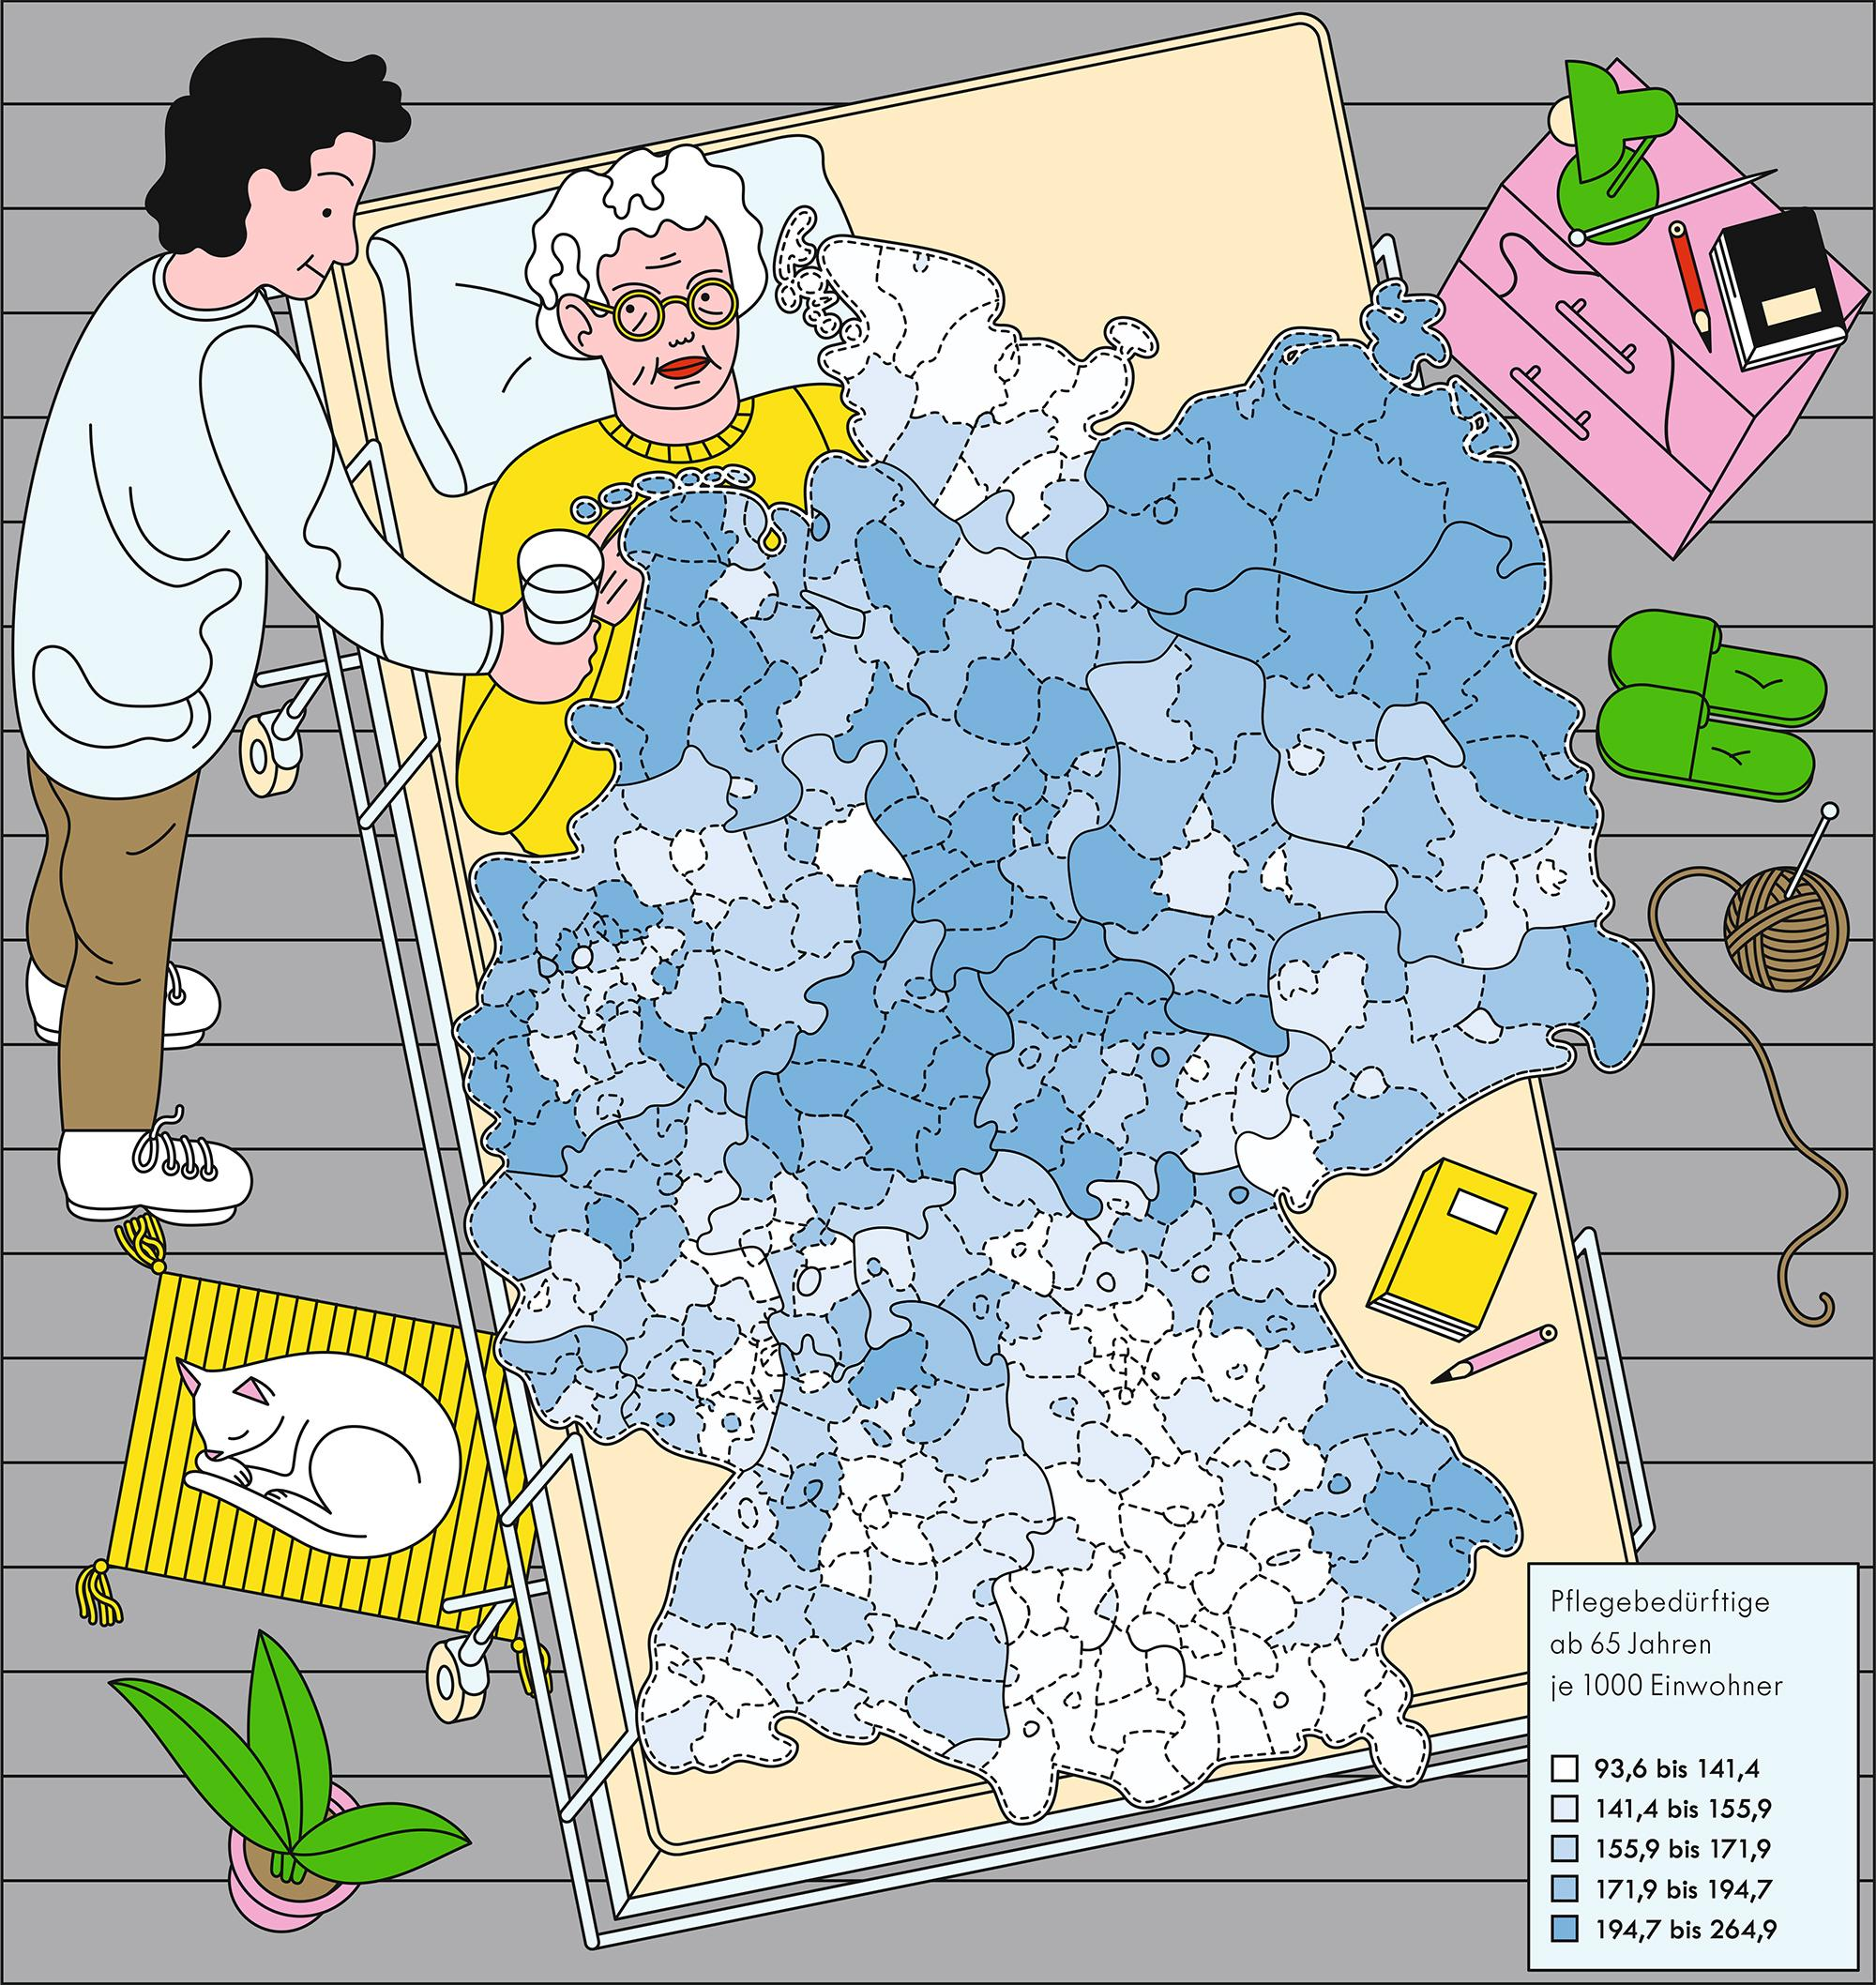 Altenpflege: Pflegebedürftige